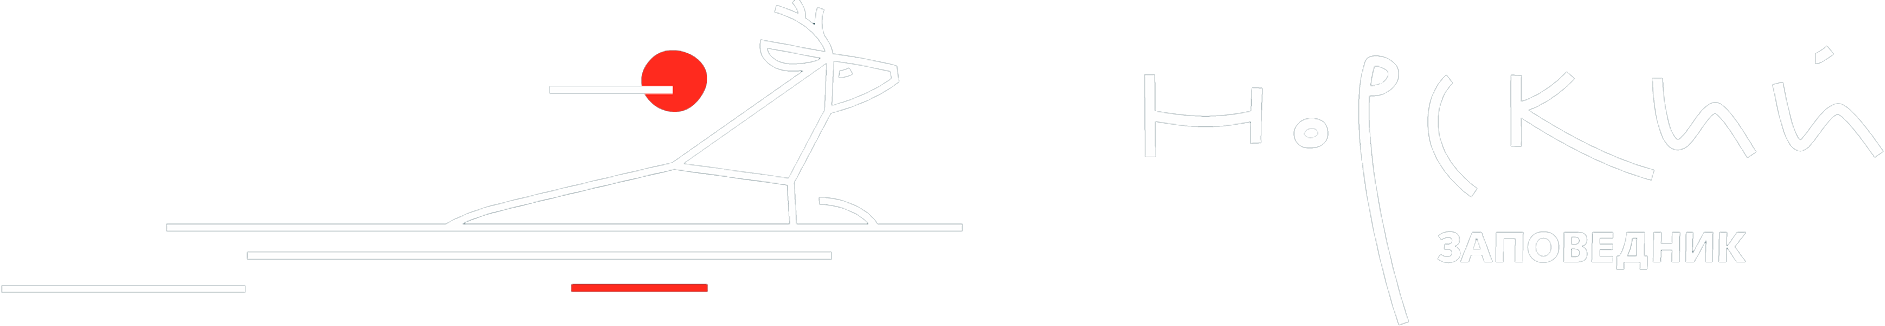 Видеоролик о Норском заповеднике